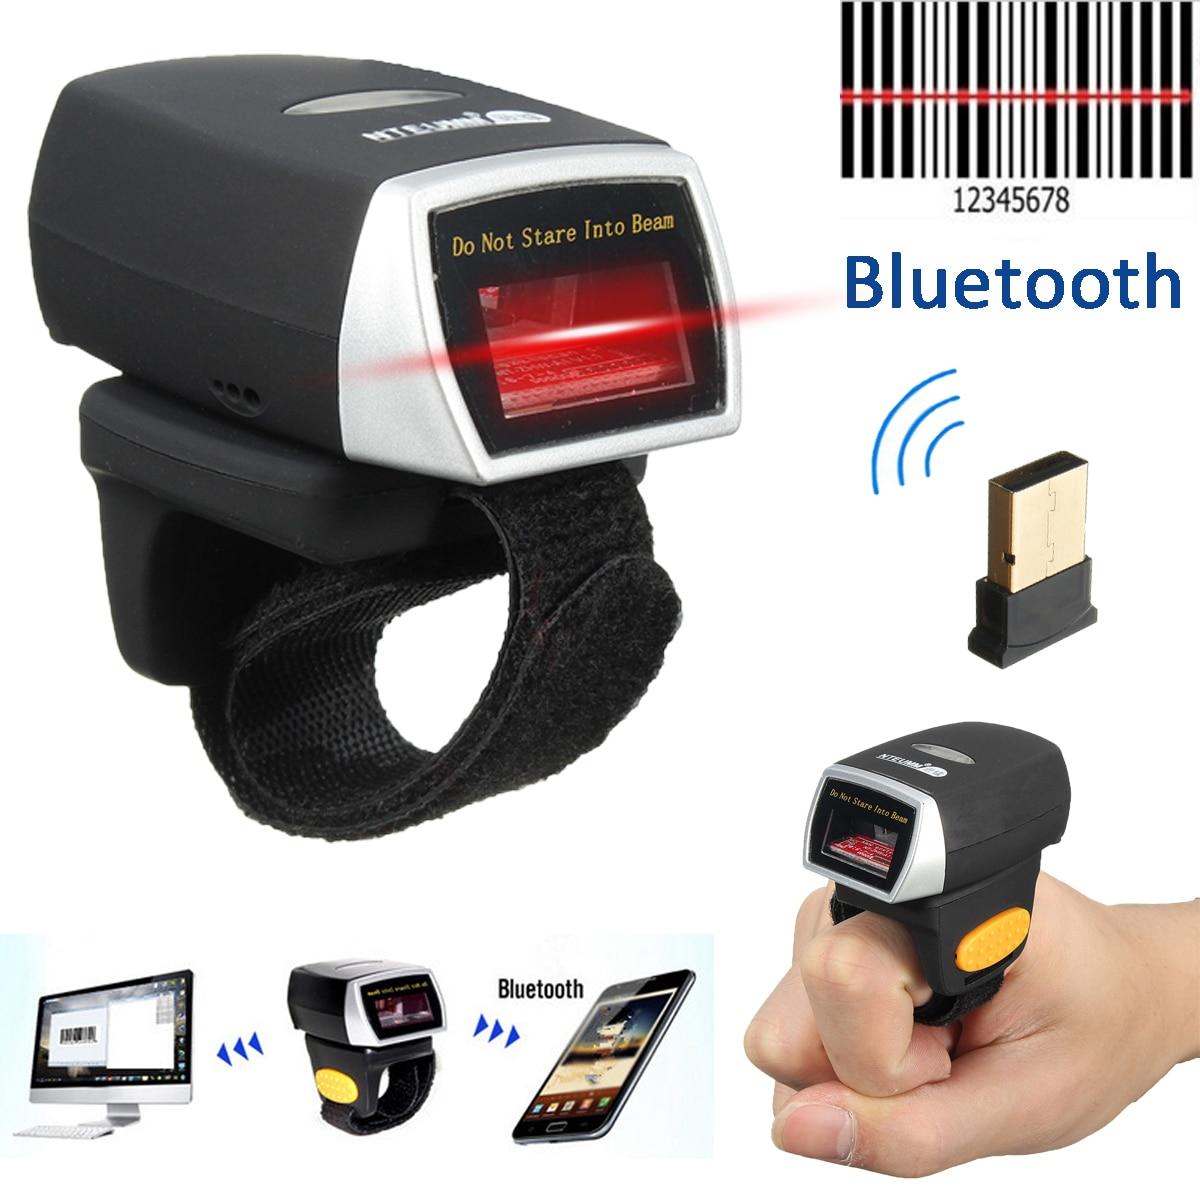 Mini Bluetooth Scanner Barcode Reader Laser Weirless Scanner Wearable Ring Bar Code Scanner 1D Reader Scan for Phone PC Tablet